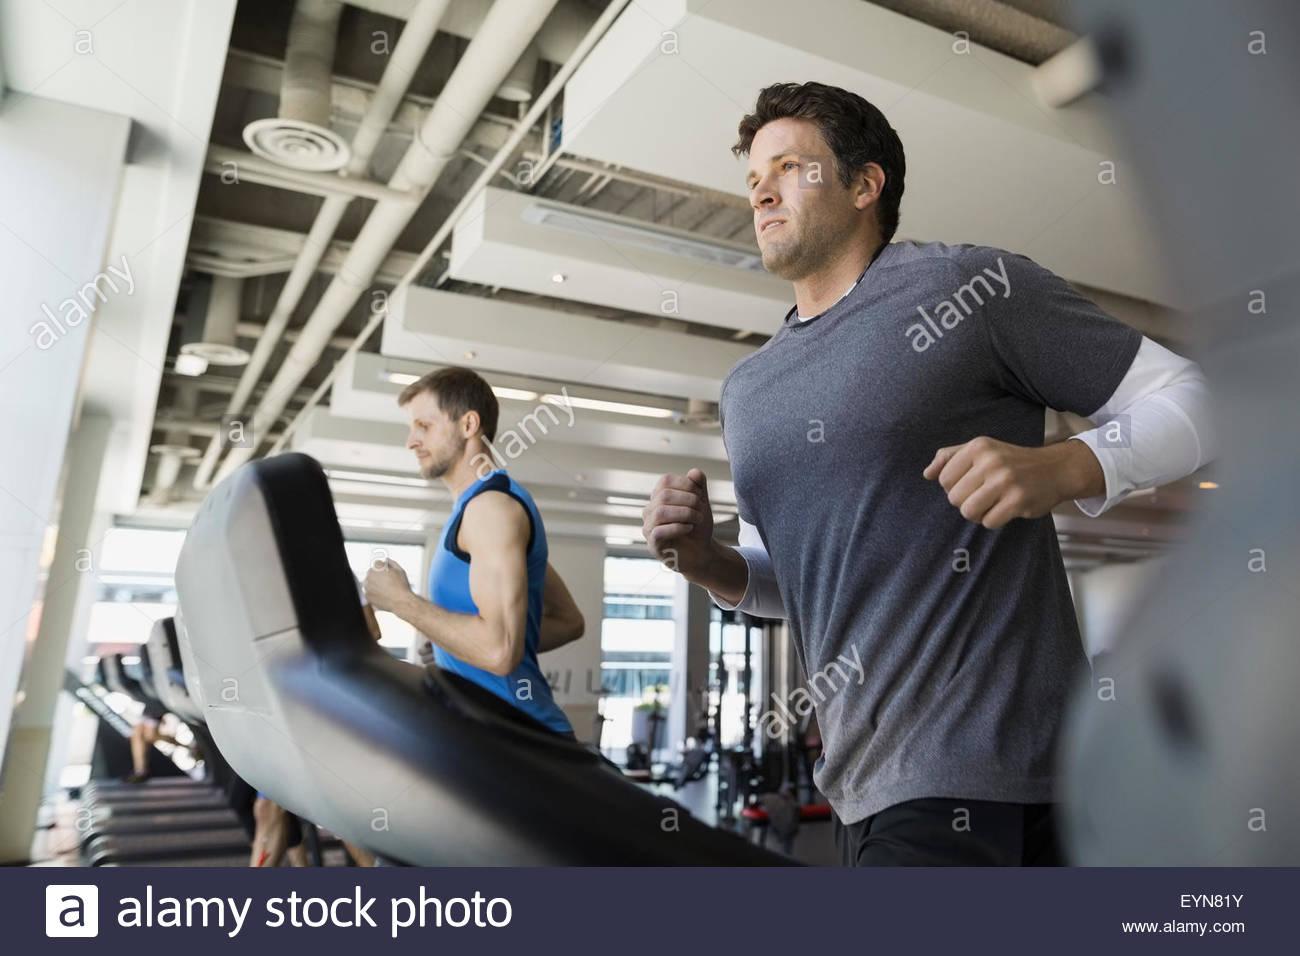 Entschlossenen Mann Joggen auf dem Laufband im Fitnessstudio Stockbild